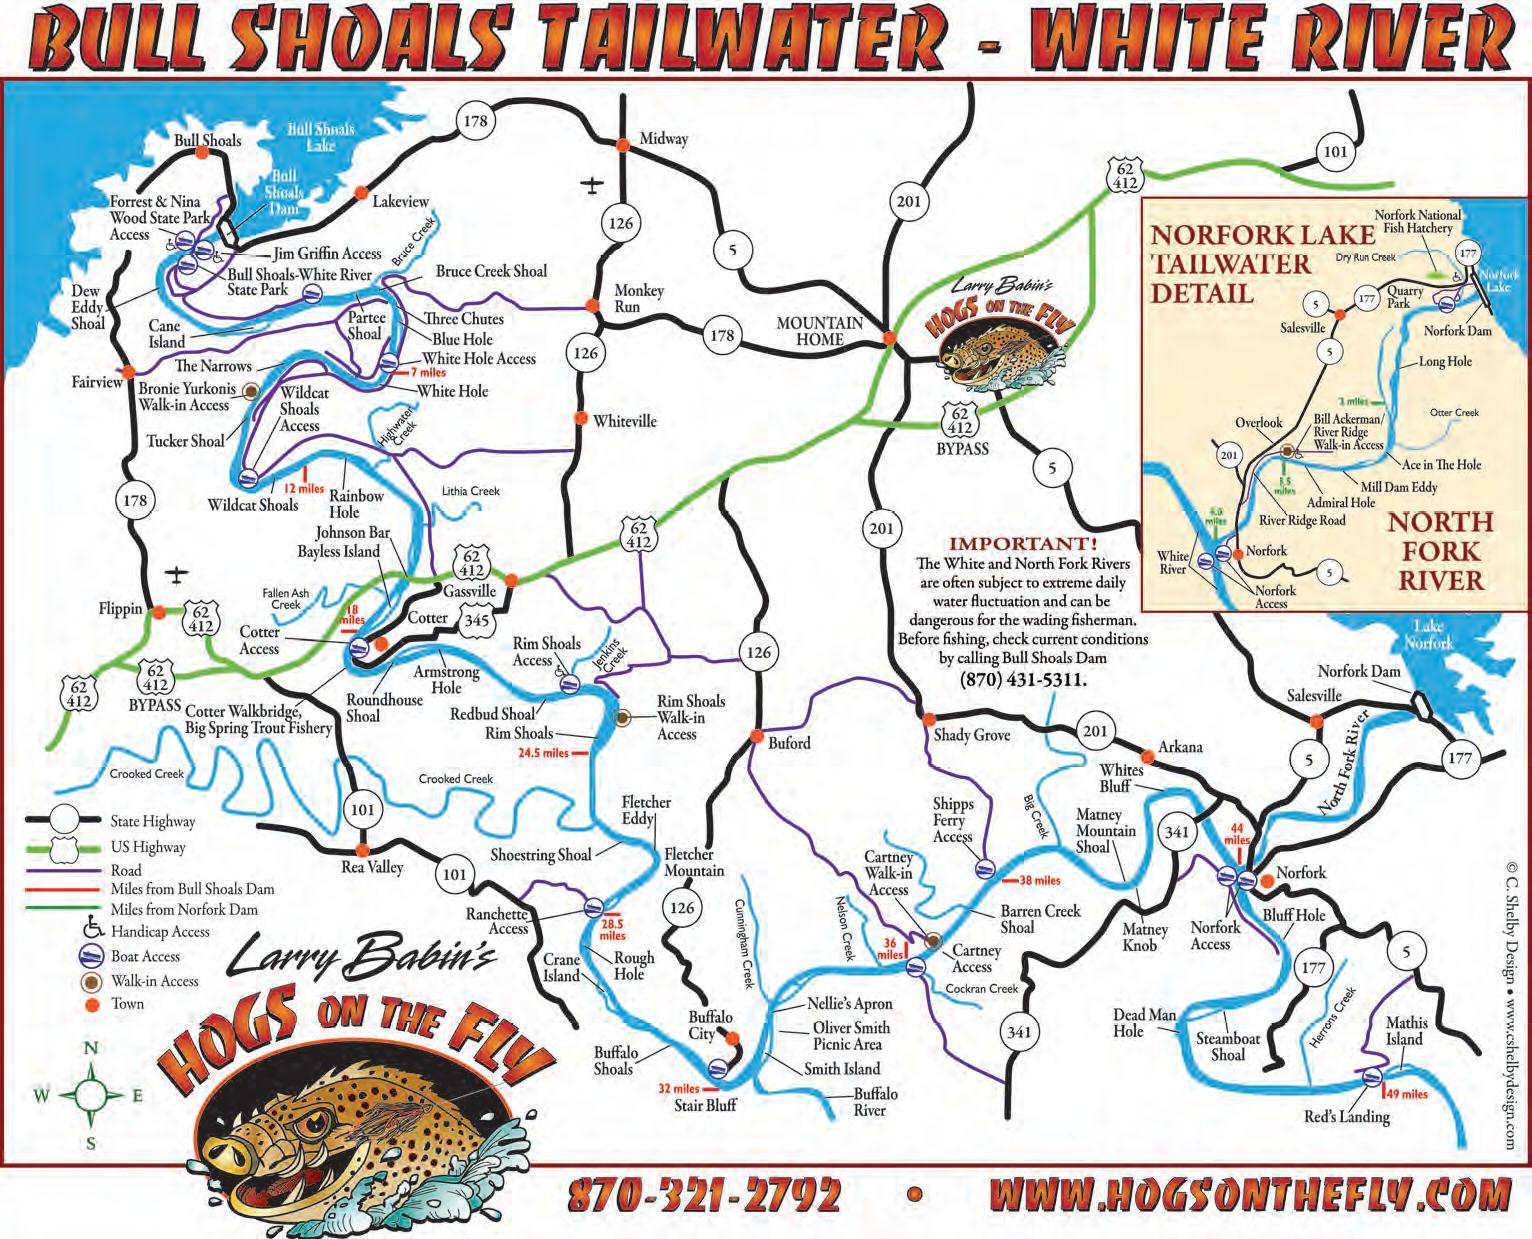 map of white river in arkansas River Maps Access White River Ozarkanglers Com Forum map of white river in arkansas